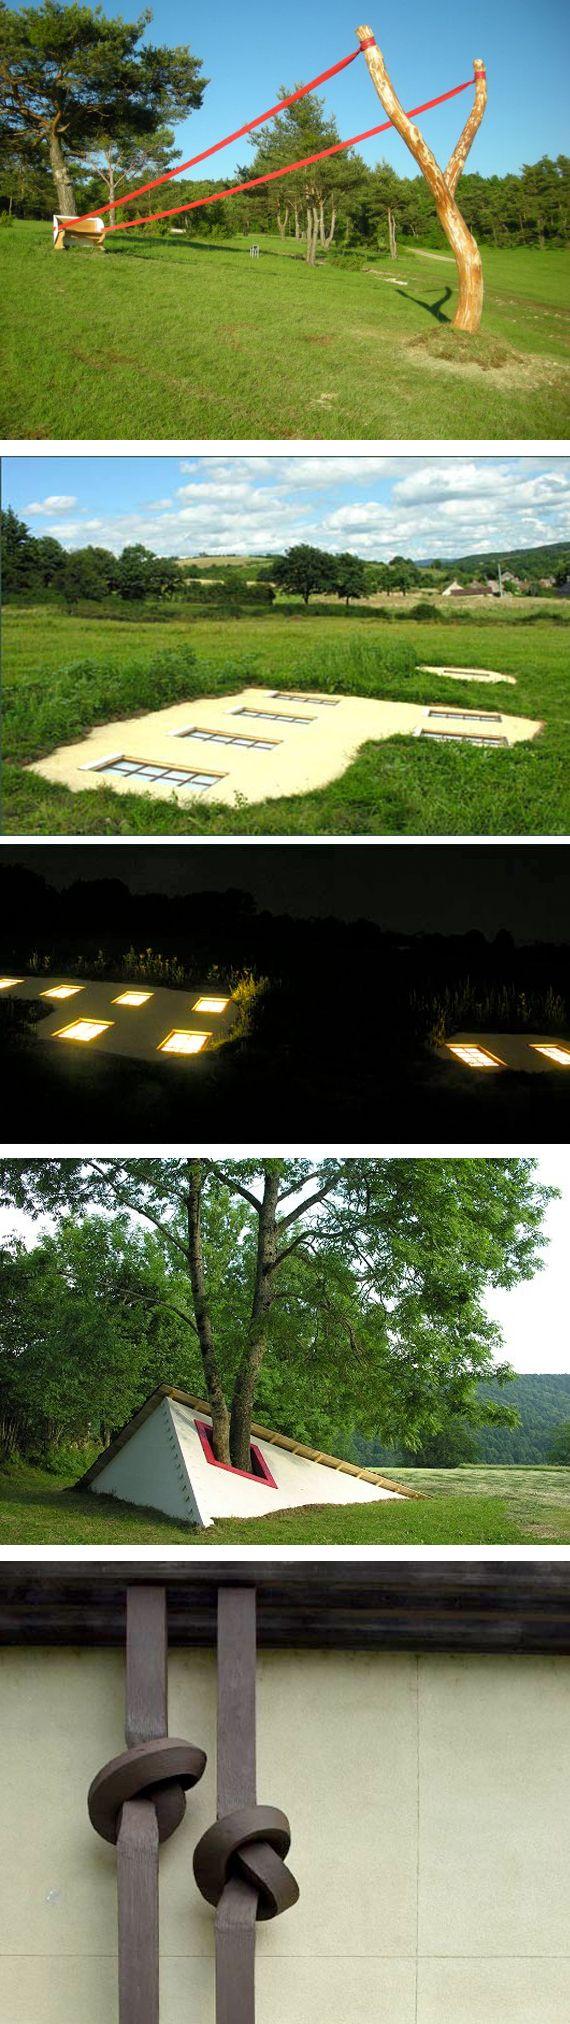 Cornelia Konrads Sculptures outdoor installation art ) The top one makes me laugh